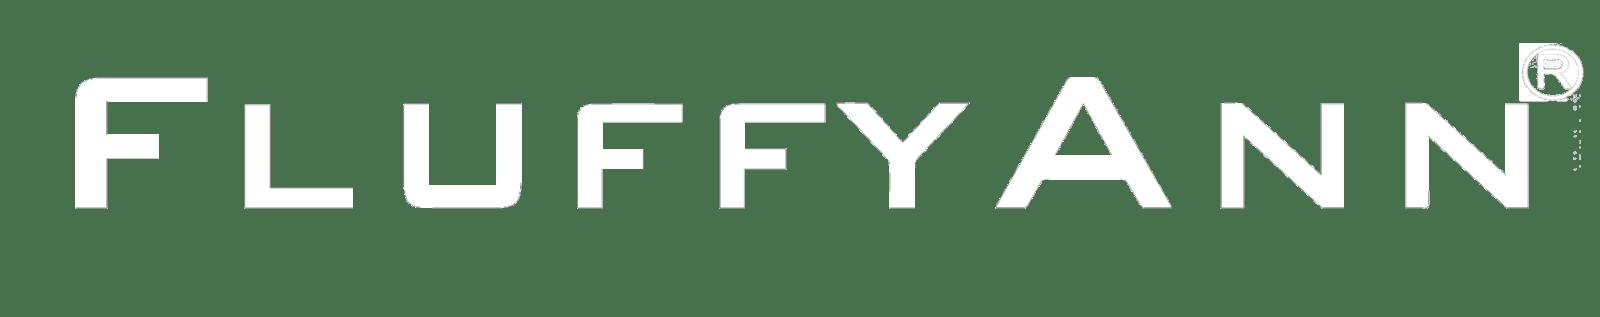 FluffyAnn